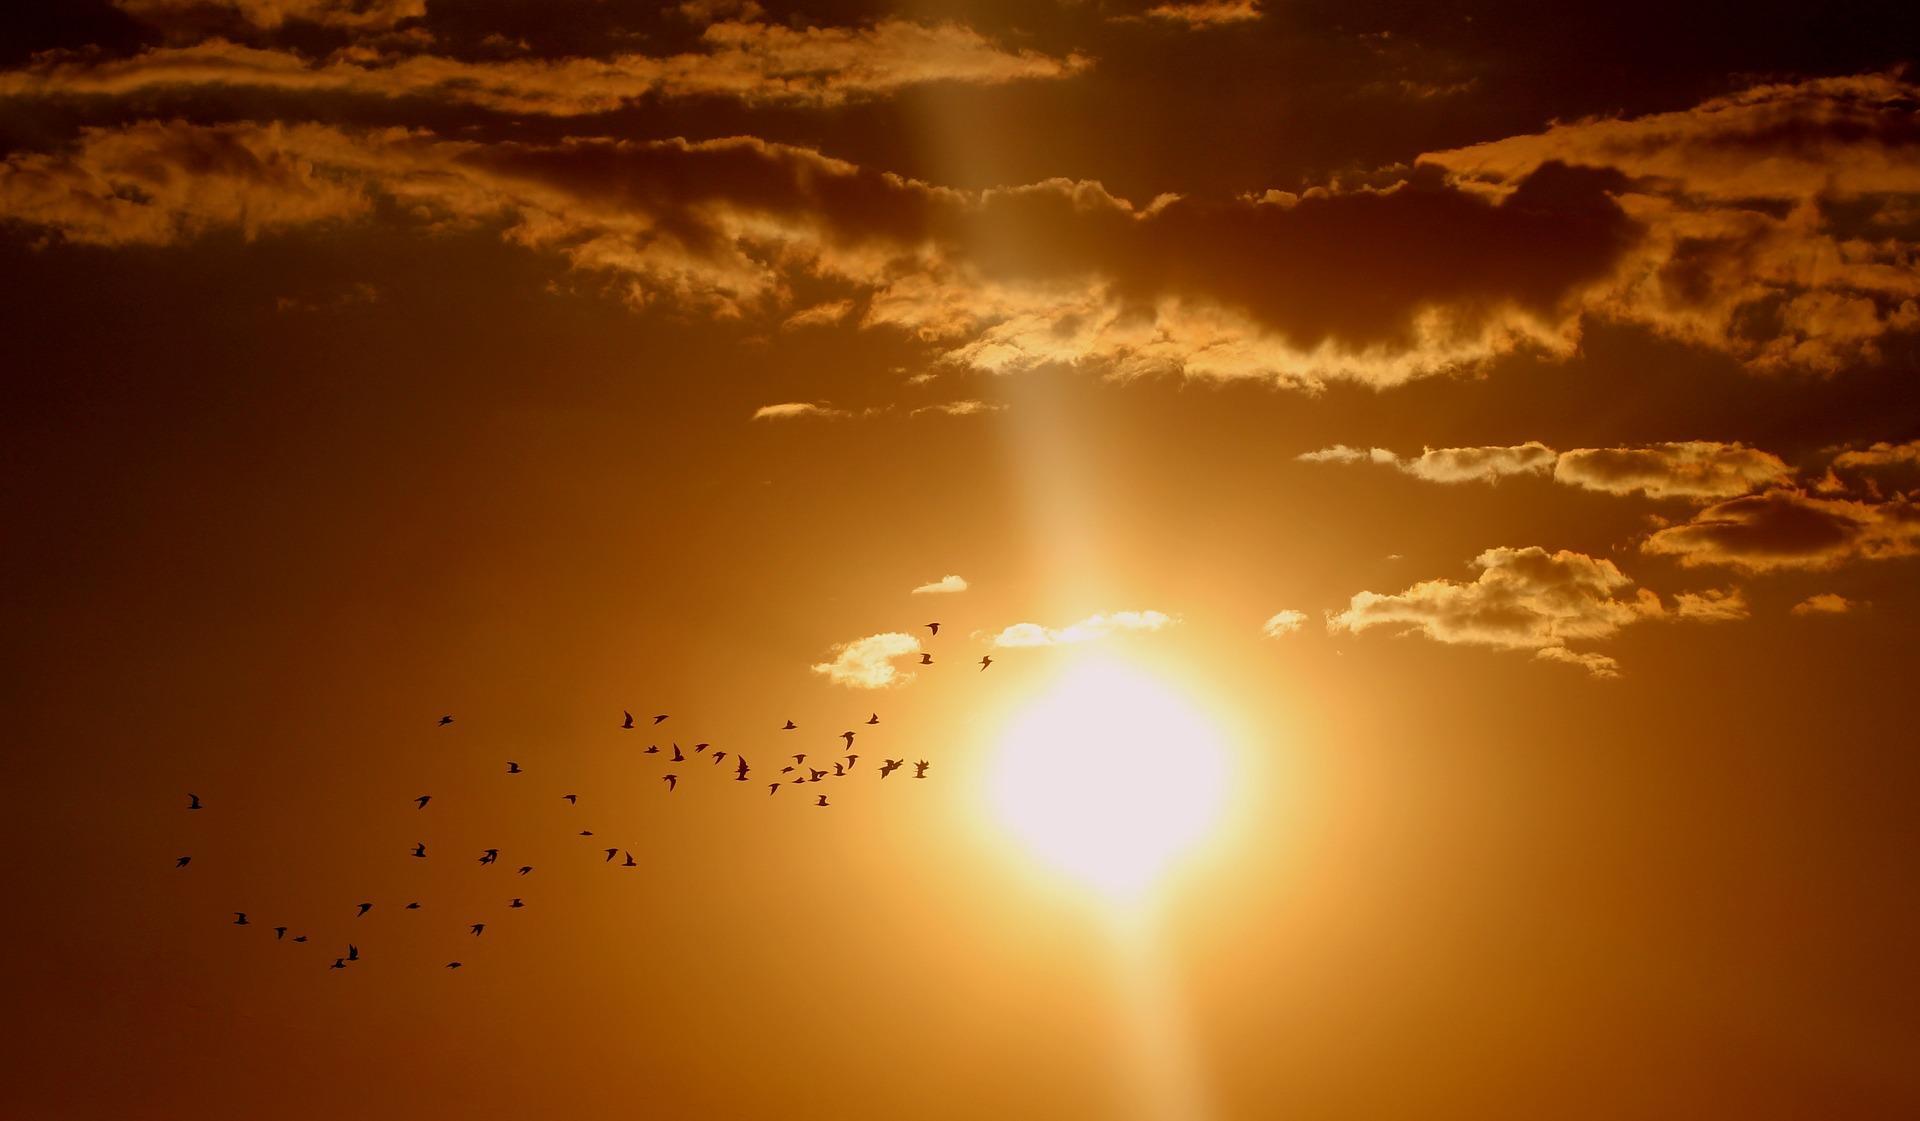 sunset-1625073_1920-1493664130615.jpg